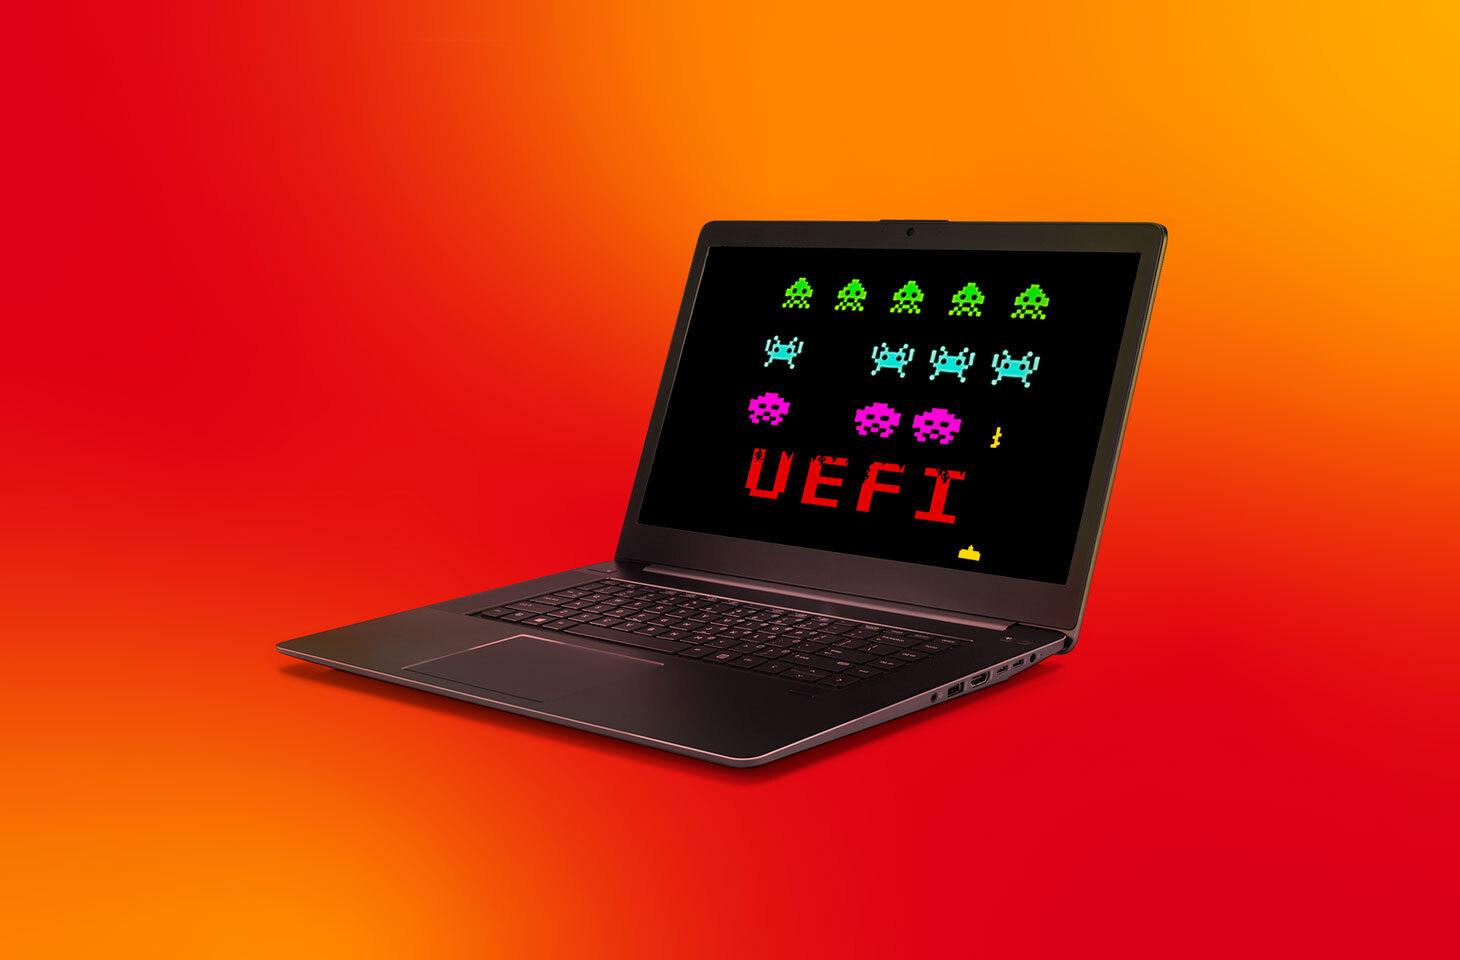 MosaicRegressor: вредоносы с доставкой через UEFI